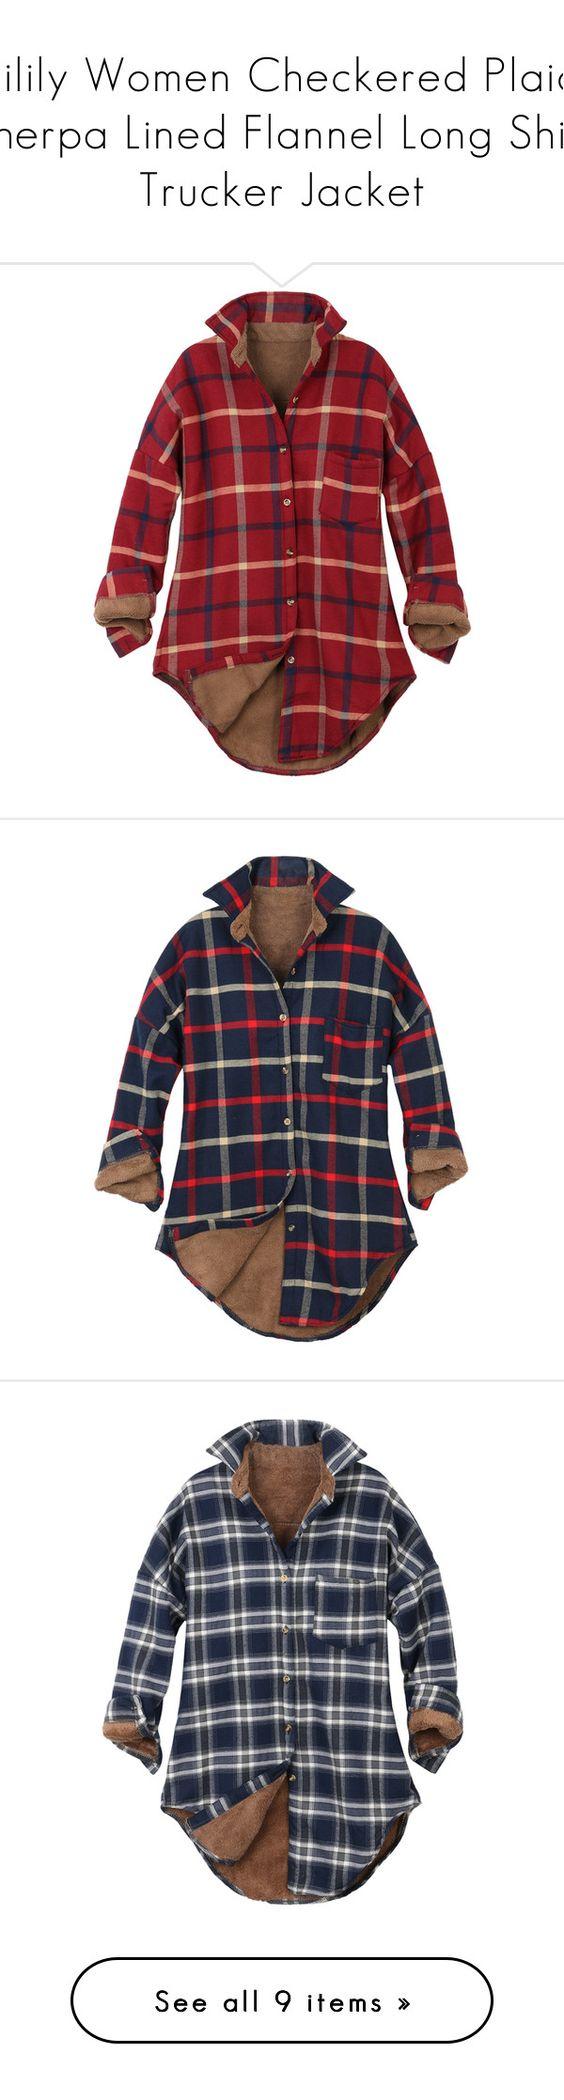 Flannel shirt women  ililily Women Checkered Plaid Sherpa Lined Flannel Long Shirt